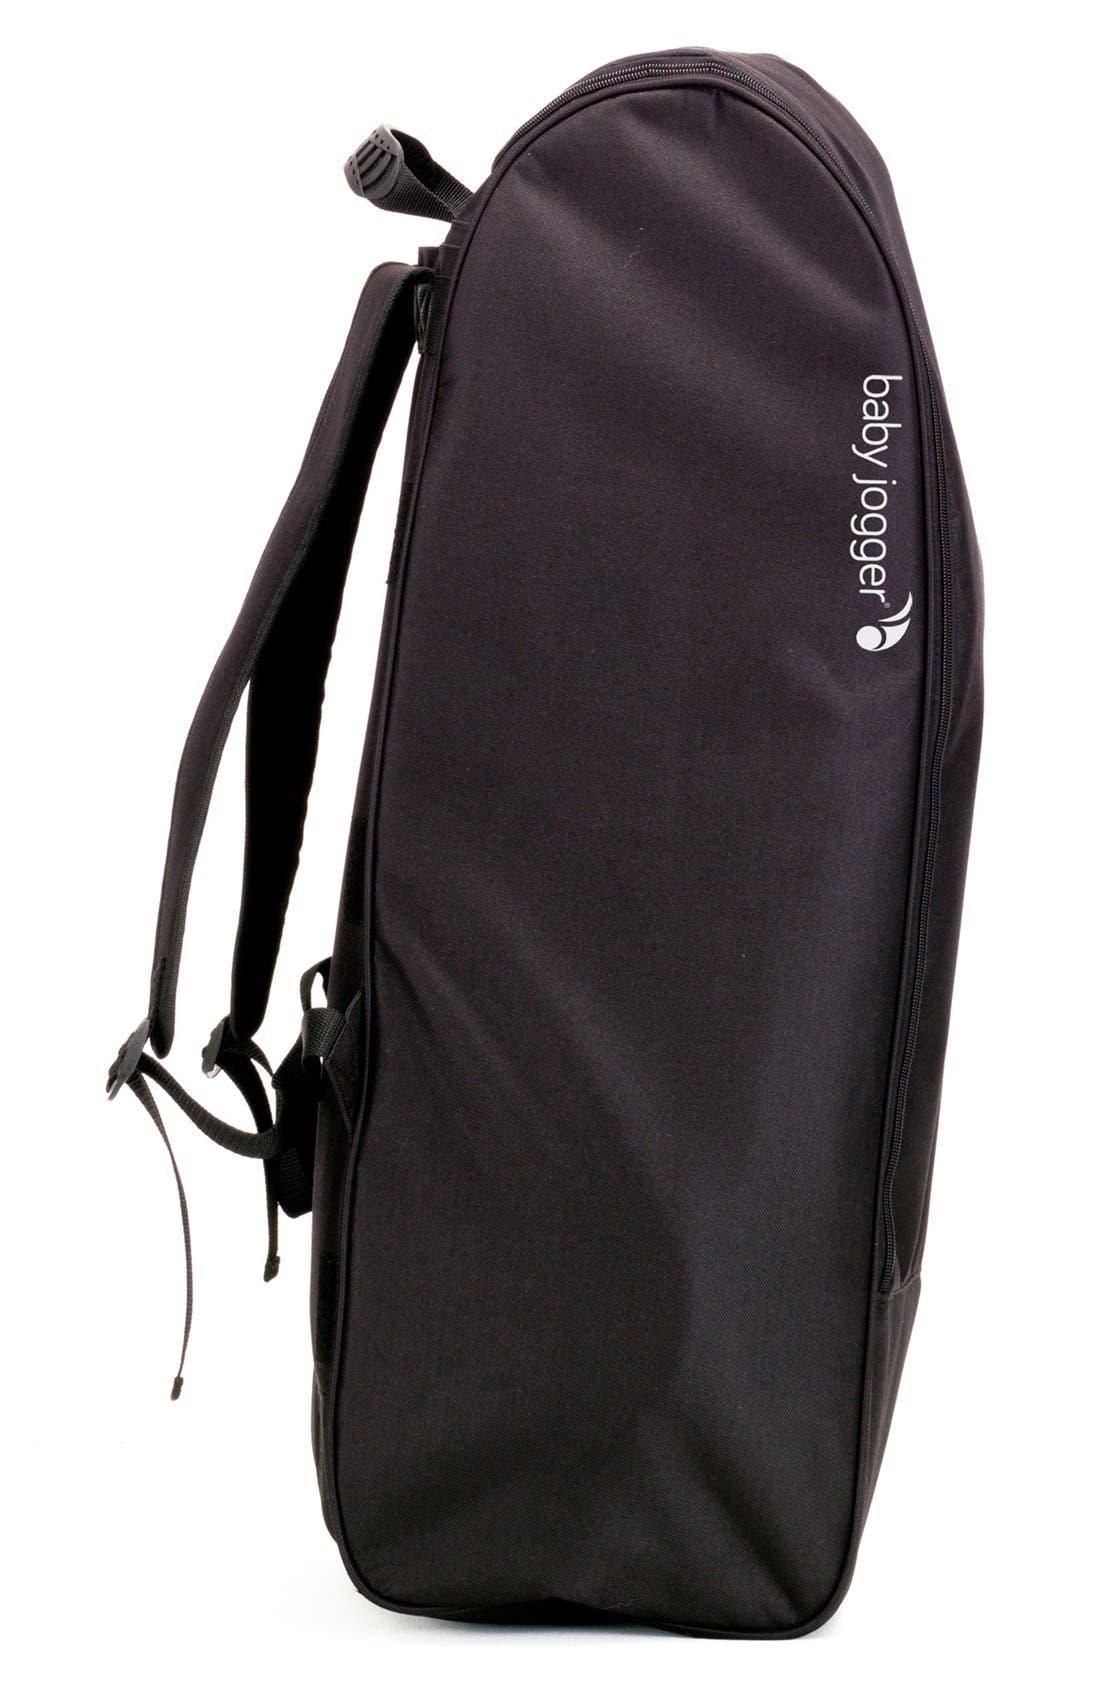 Alternate Image 1 Selected - Baby Jogger 'City Mini® ZIP' Stroller Backpack Carry Bag